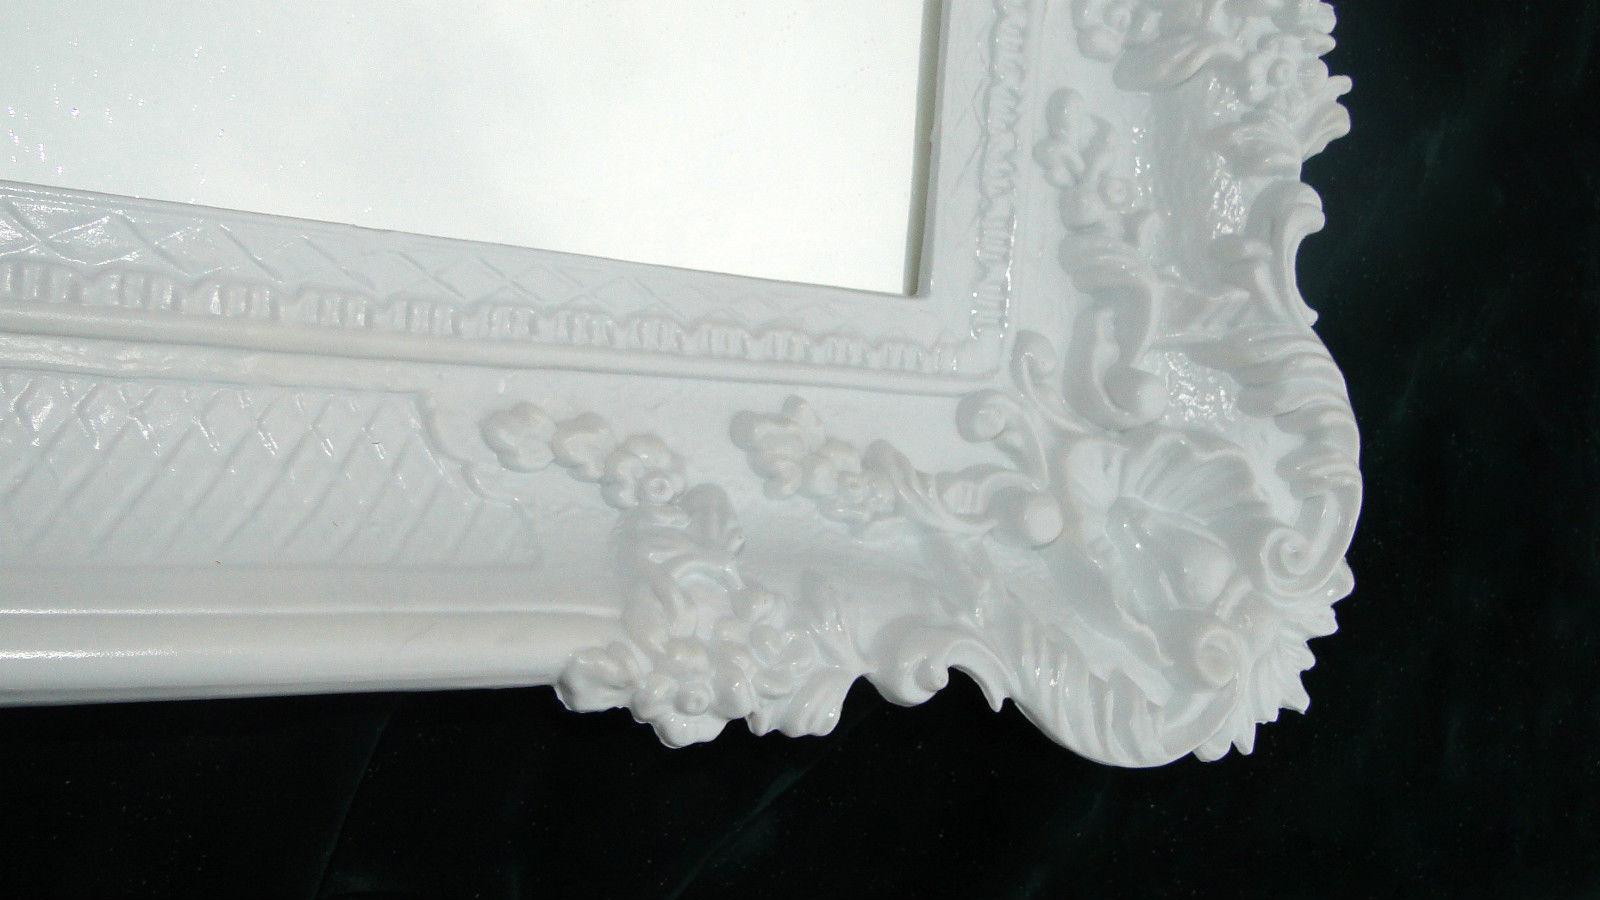 wandspiegel barock spiegel antik 97x57 badspiegel weiss hochglanz reg 3074 1 kaufen bei. Black Bedroom Furniture Sets. Home Design Ideas